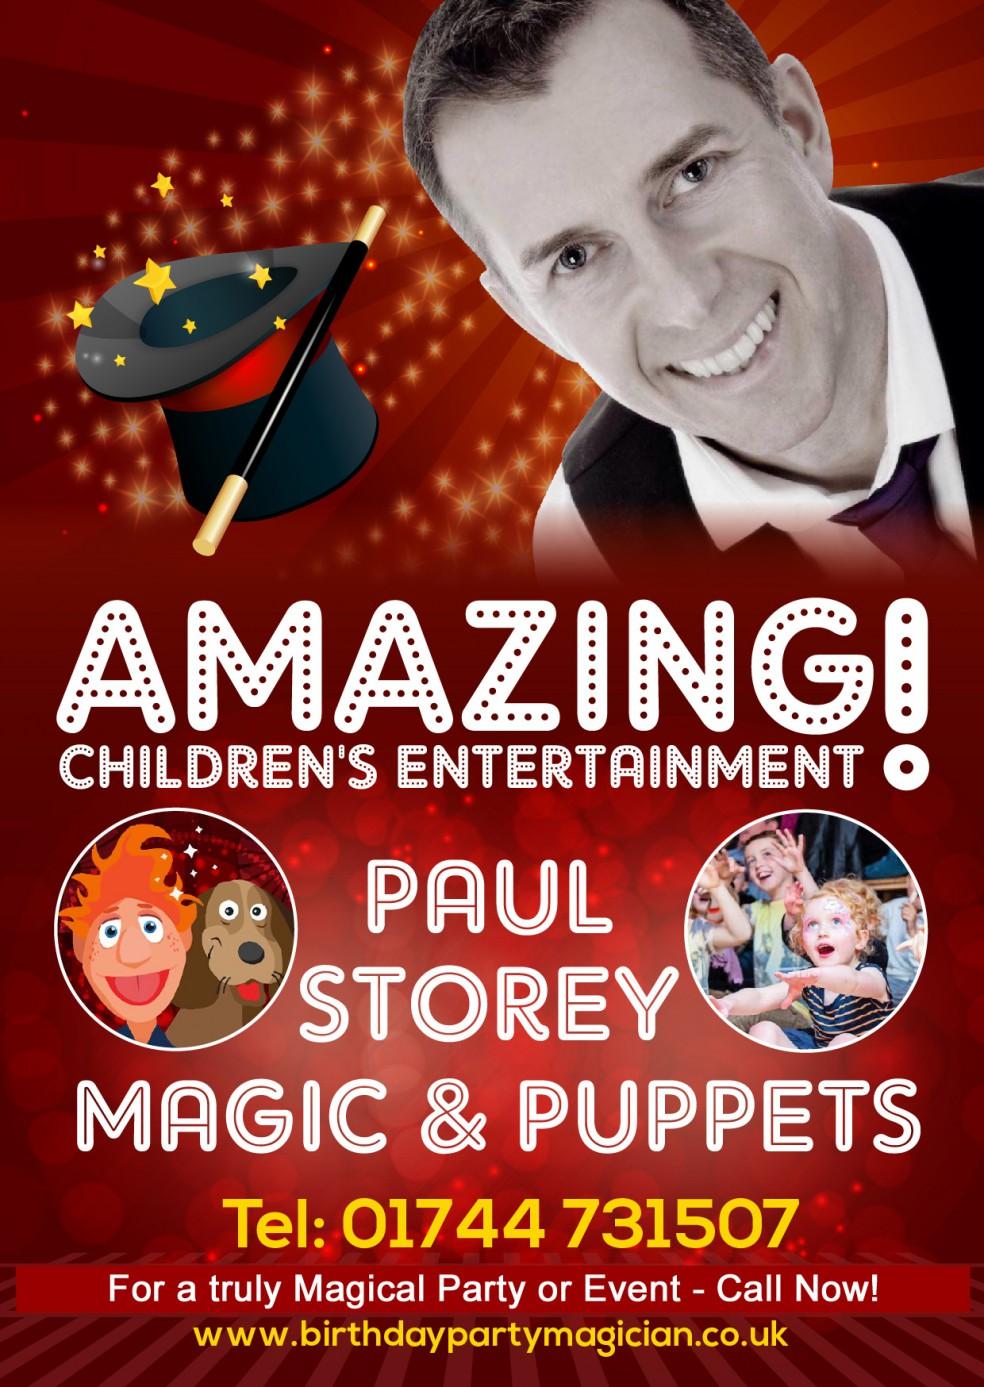 Magician, children's magician, children's entertainer, magic, puppets